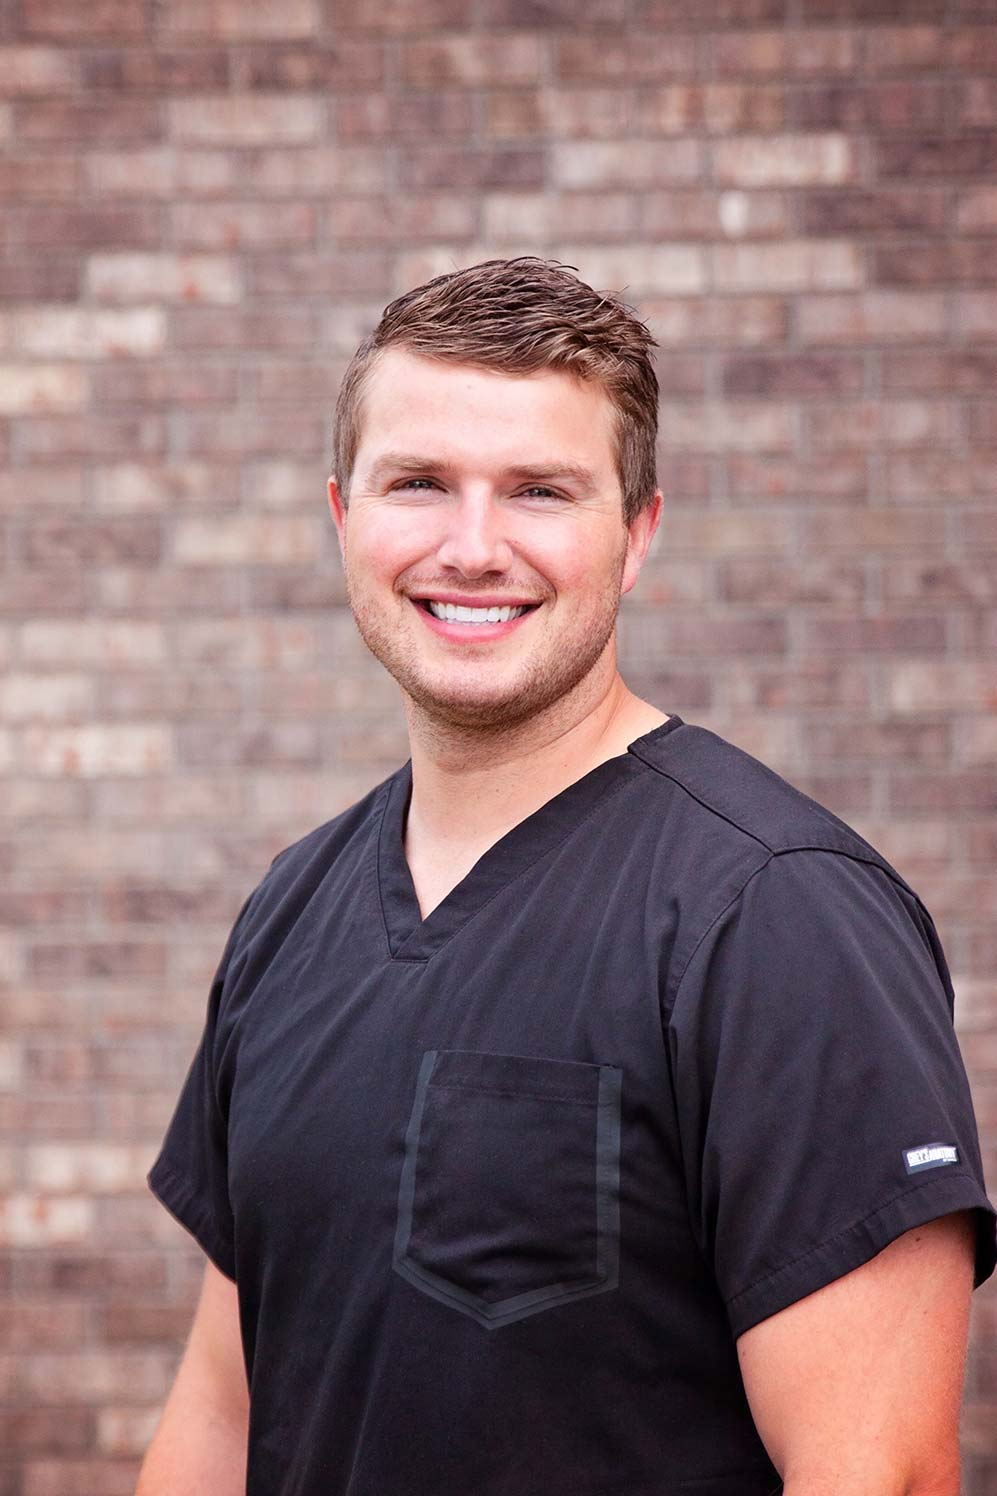 Dr. SEAN BRINGHURST